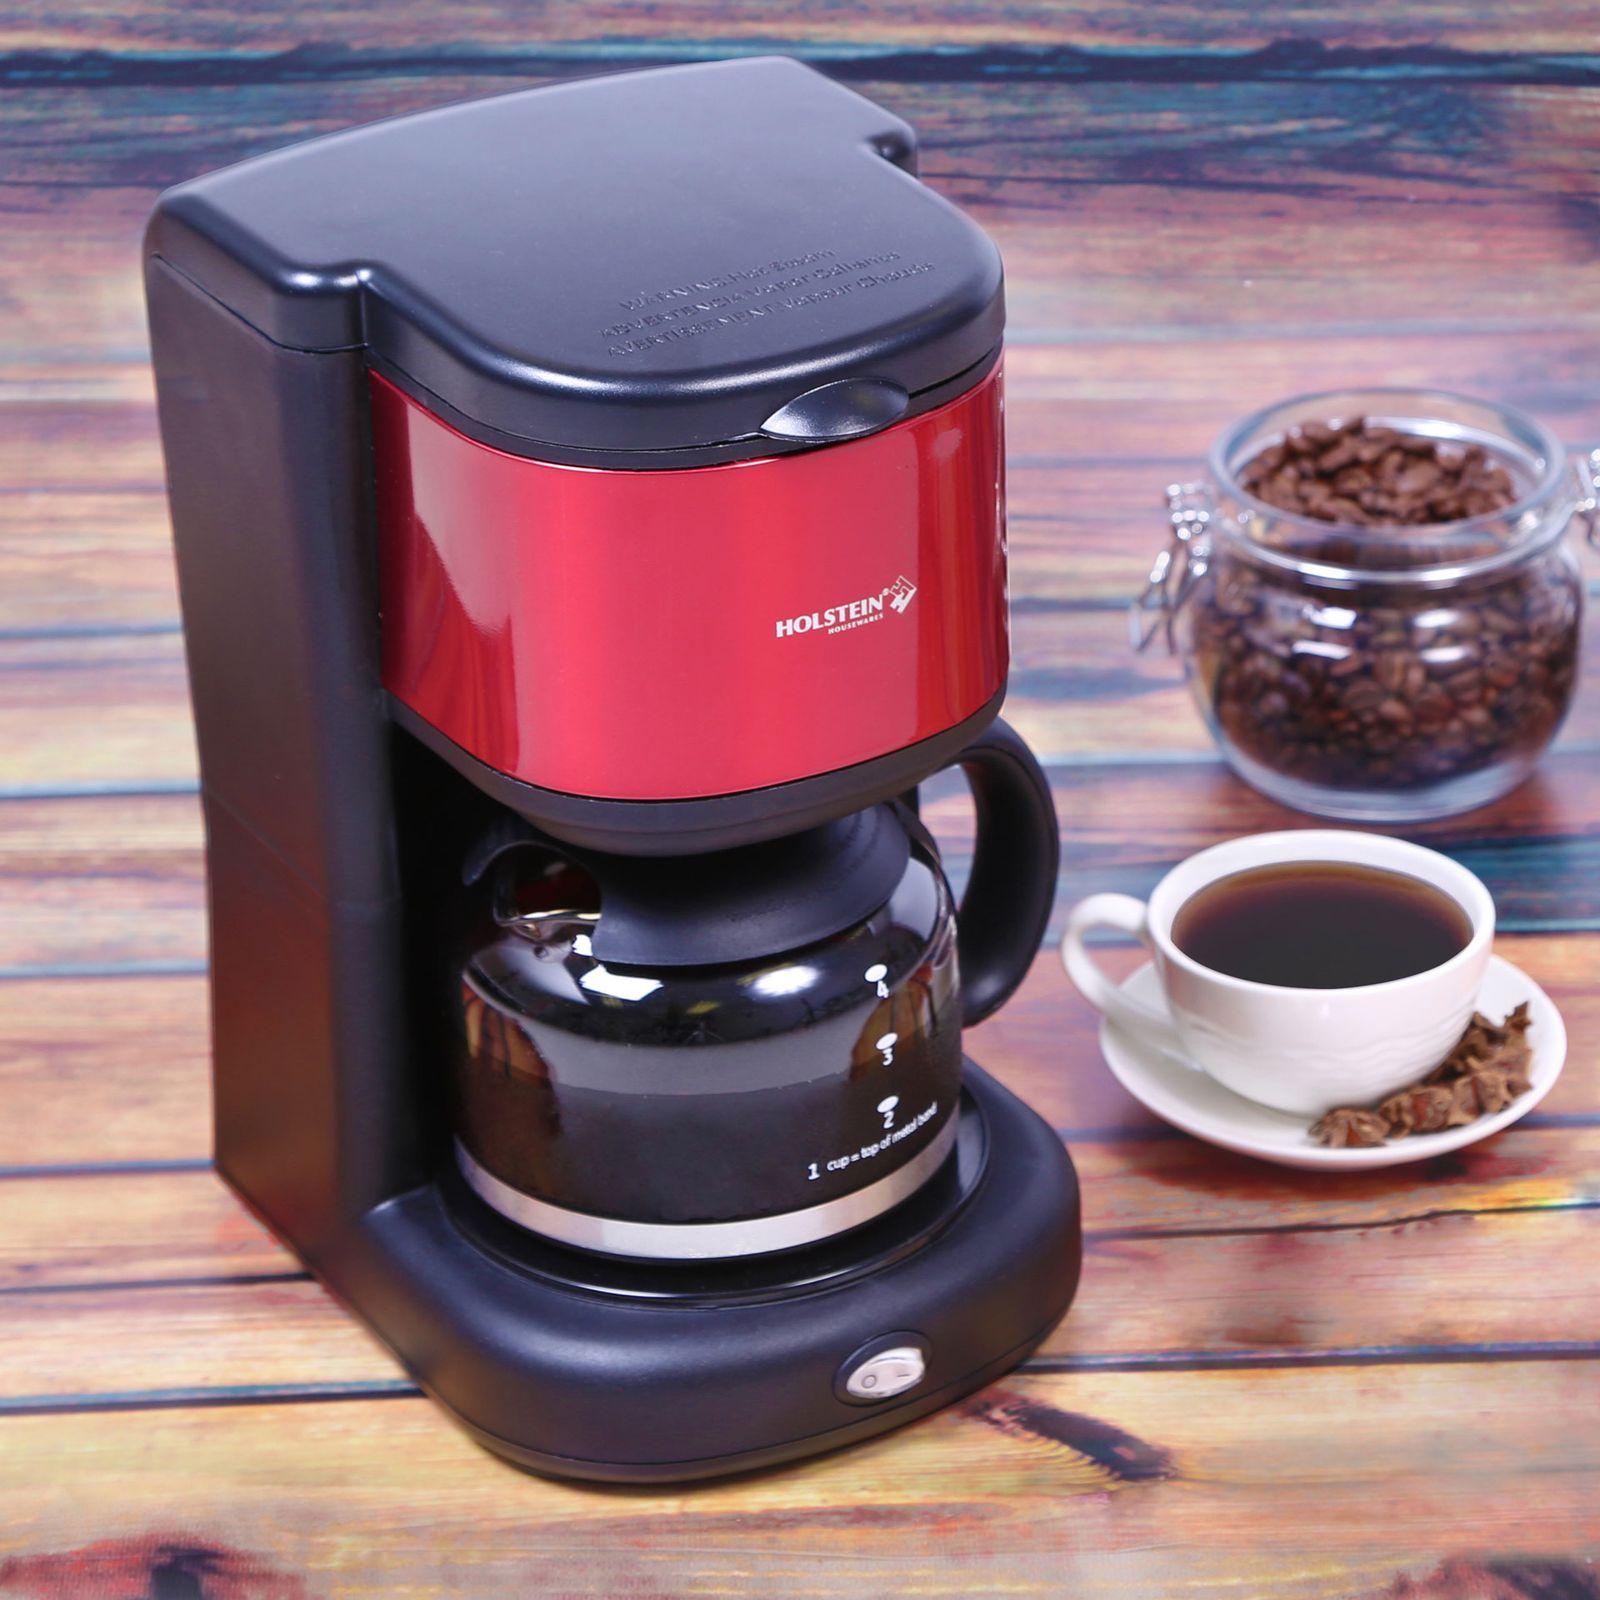 Good Housekeeping Coffee Maker Ratings : Holstein 4-Cup Coffee Maker #7109 Review